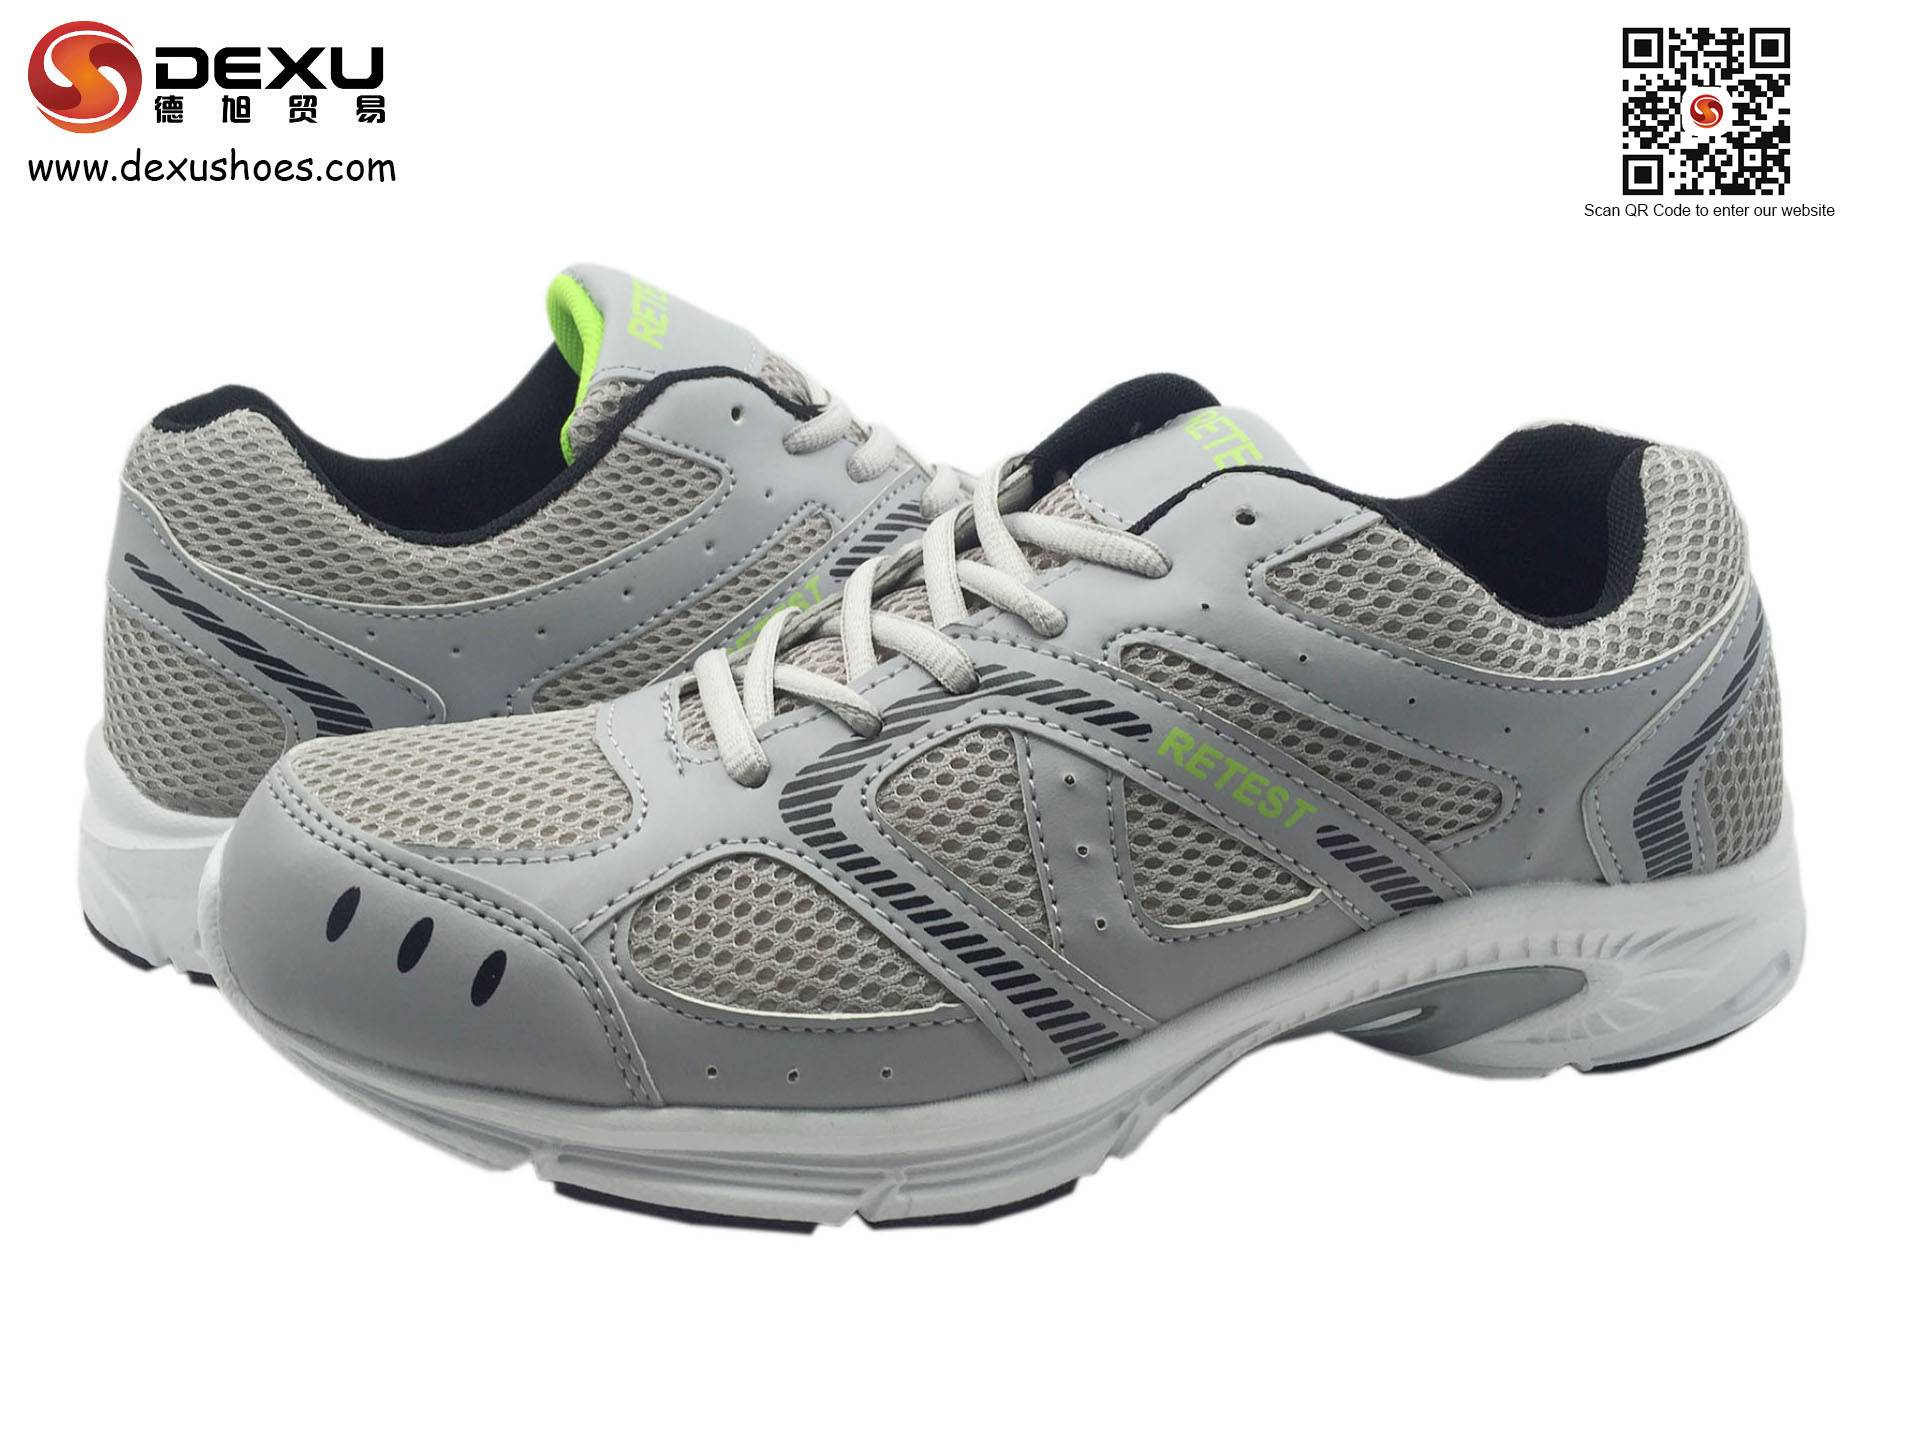 DEXU New model mens sports shoes